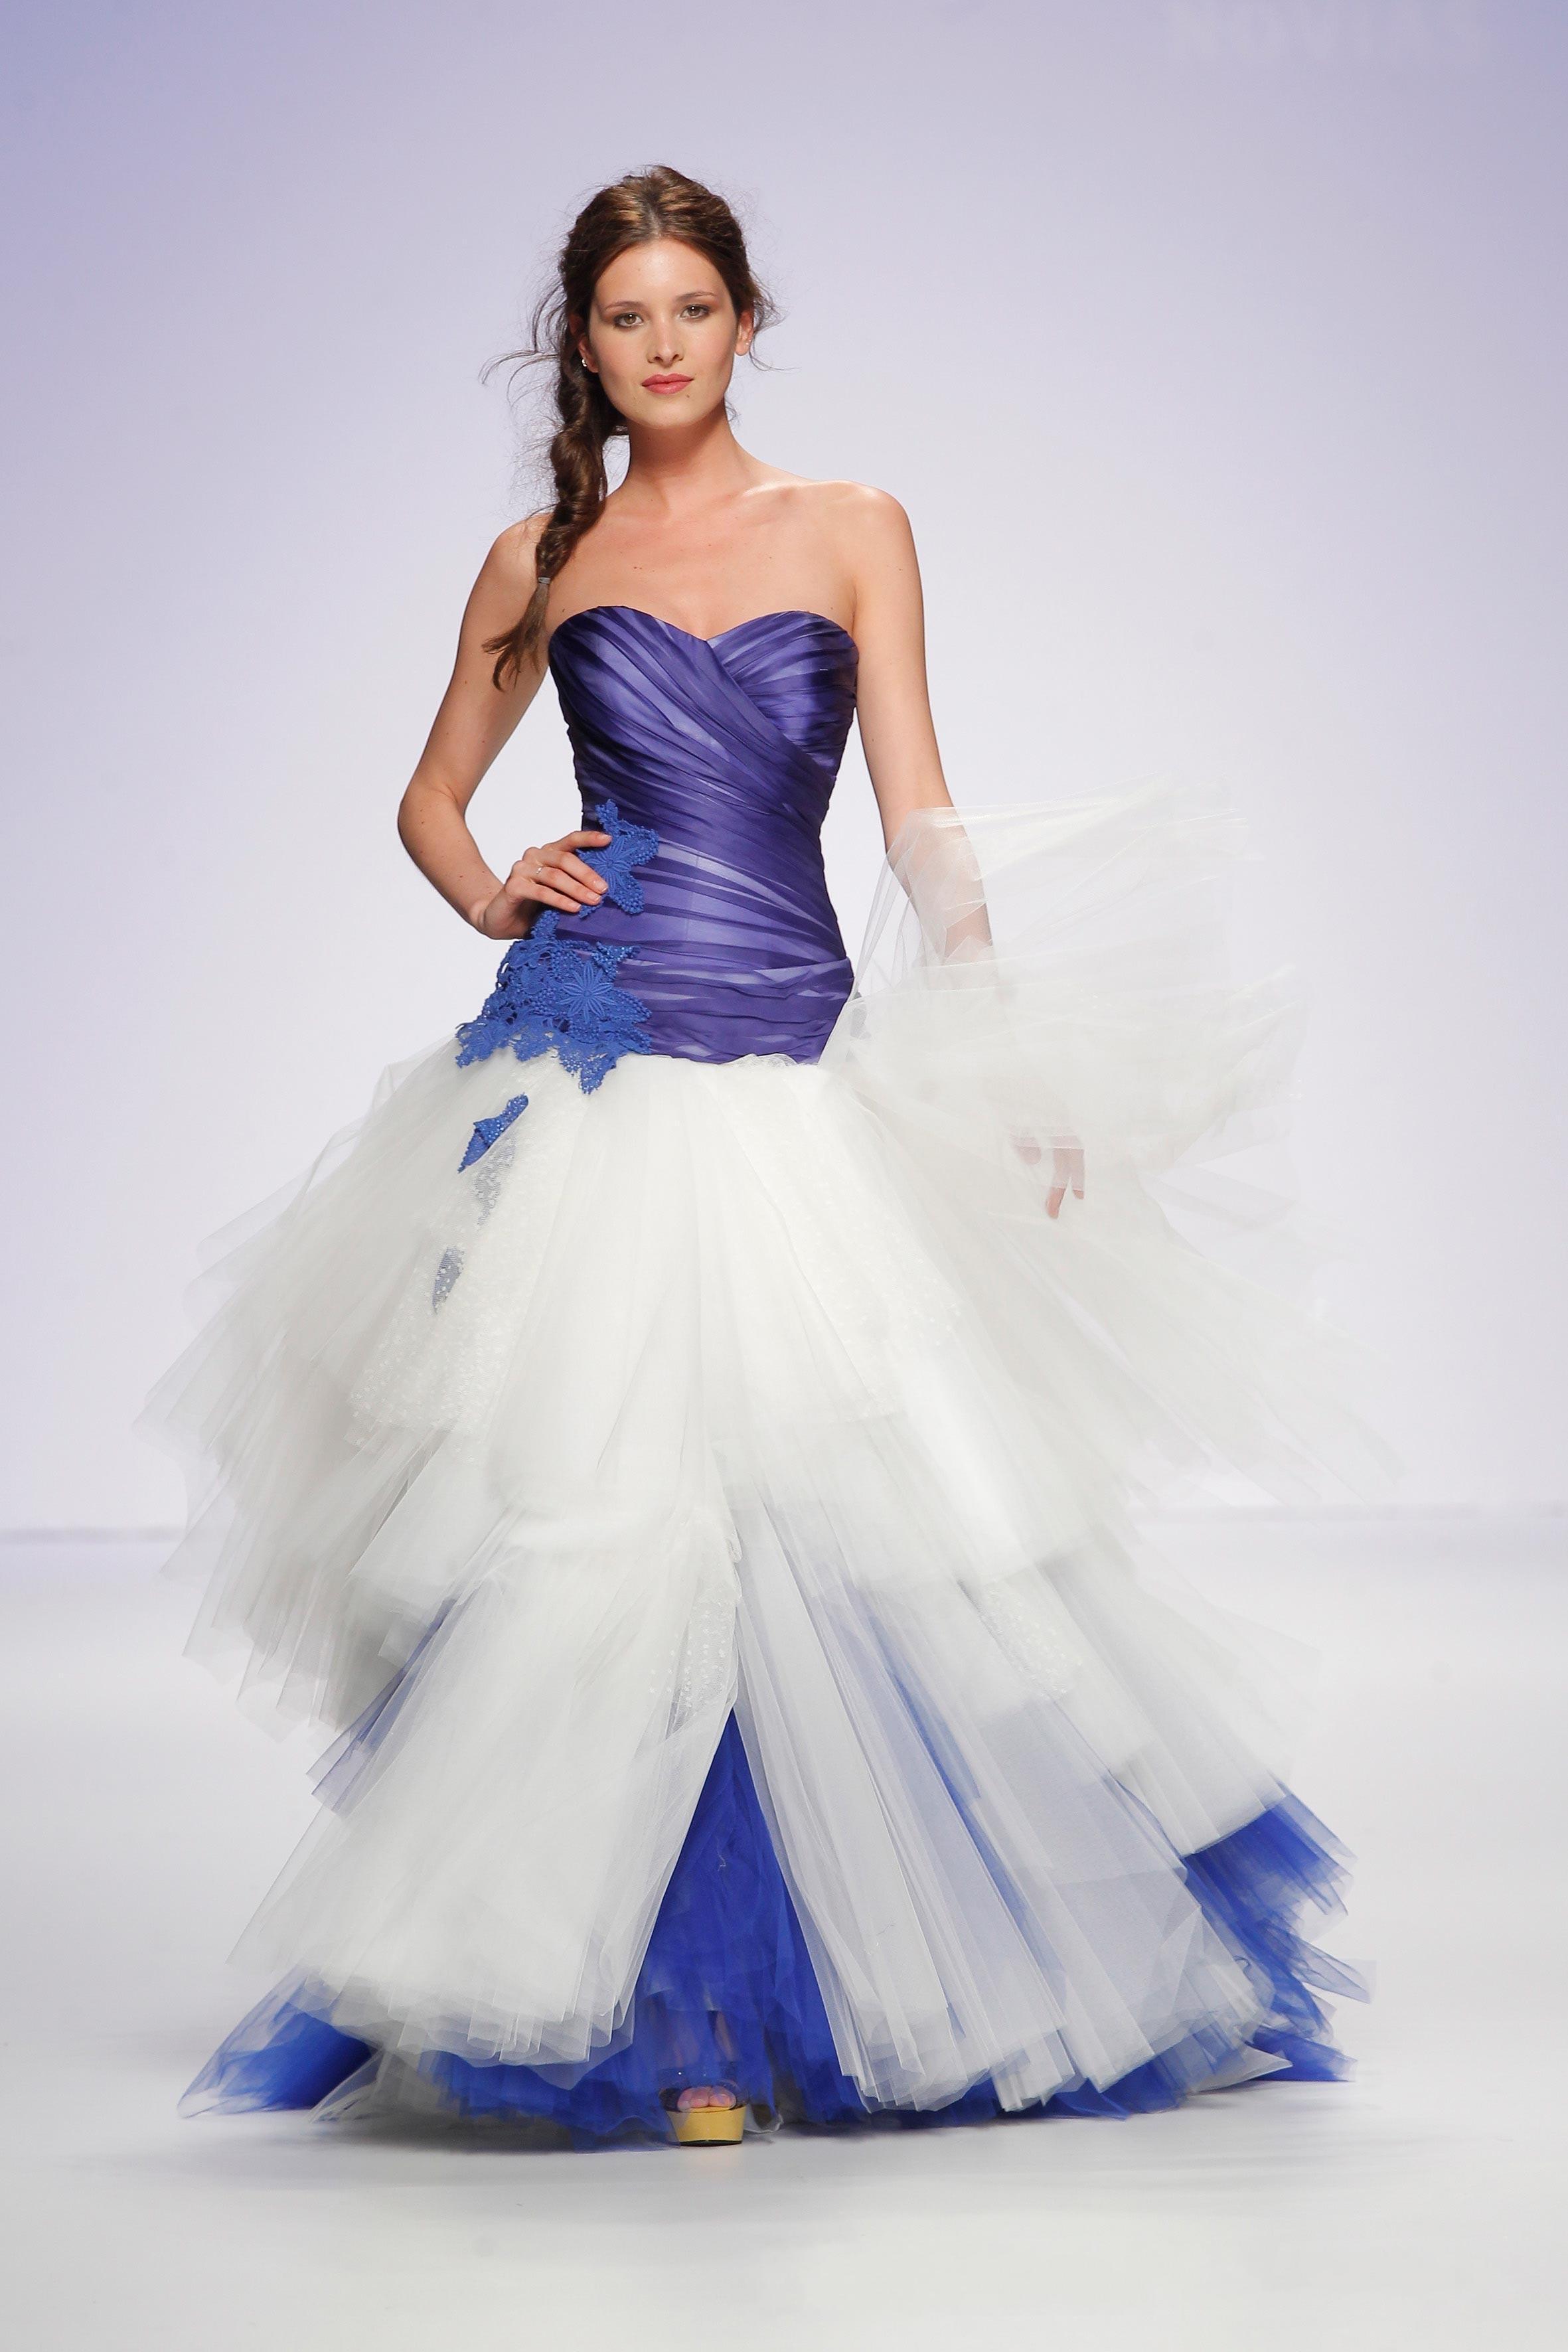 wedding dresses modern color wedding dress with color Wedding Dresses Modern Color 58